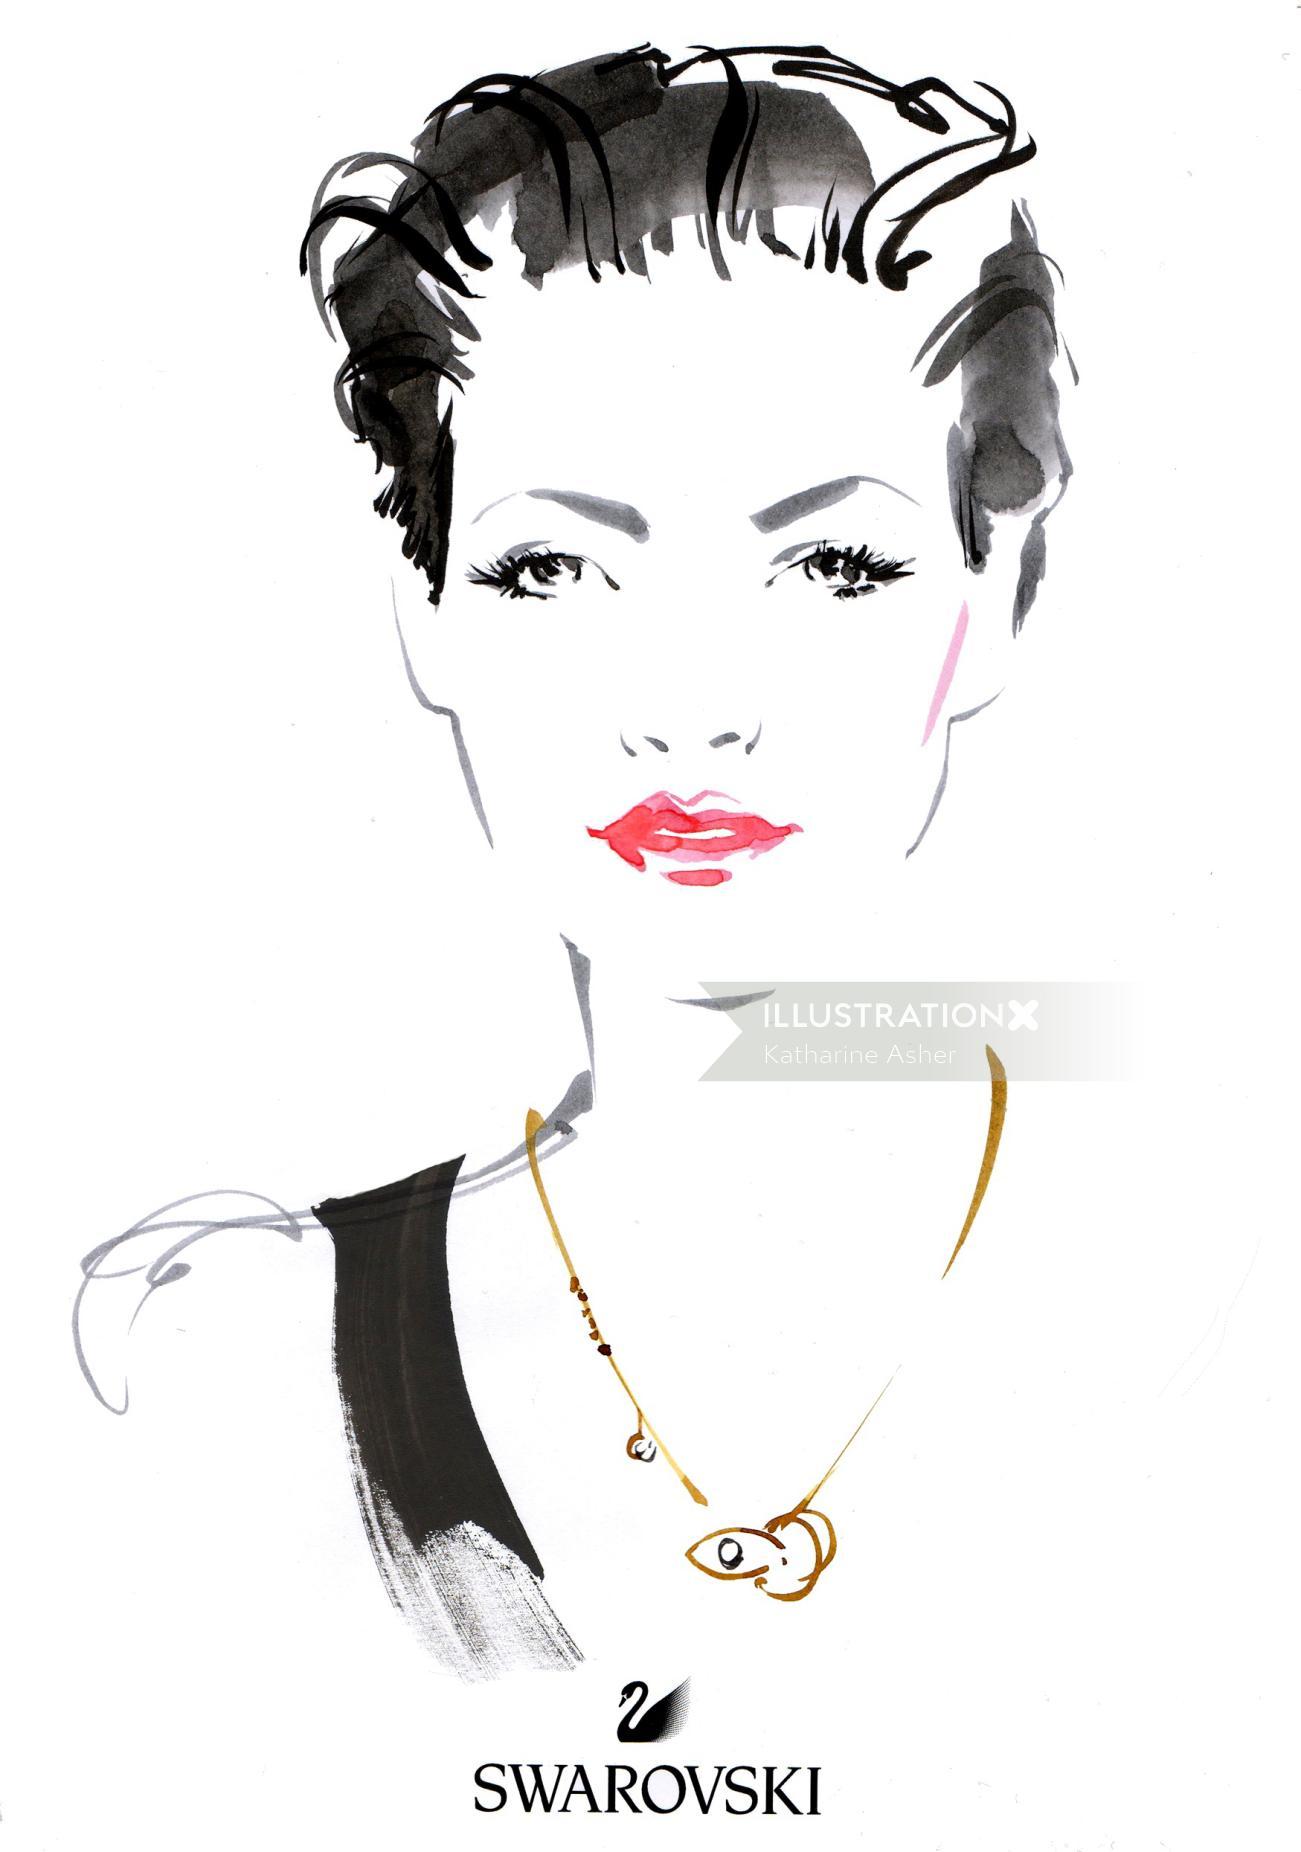 Live drawing of woman at Swarvoski - Oxford Street